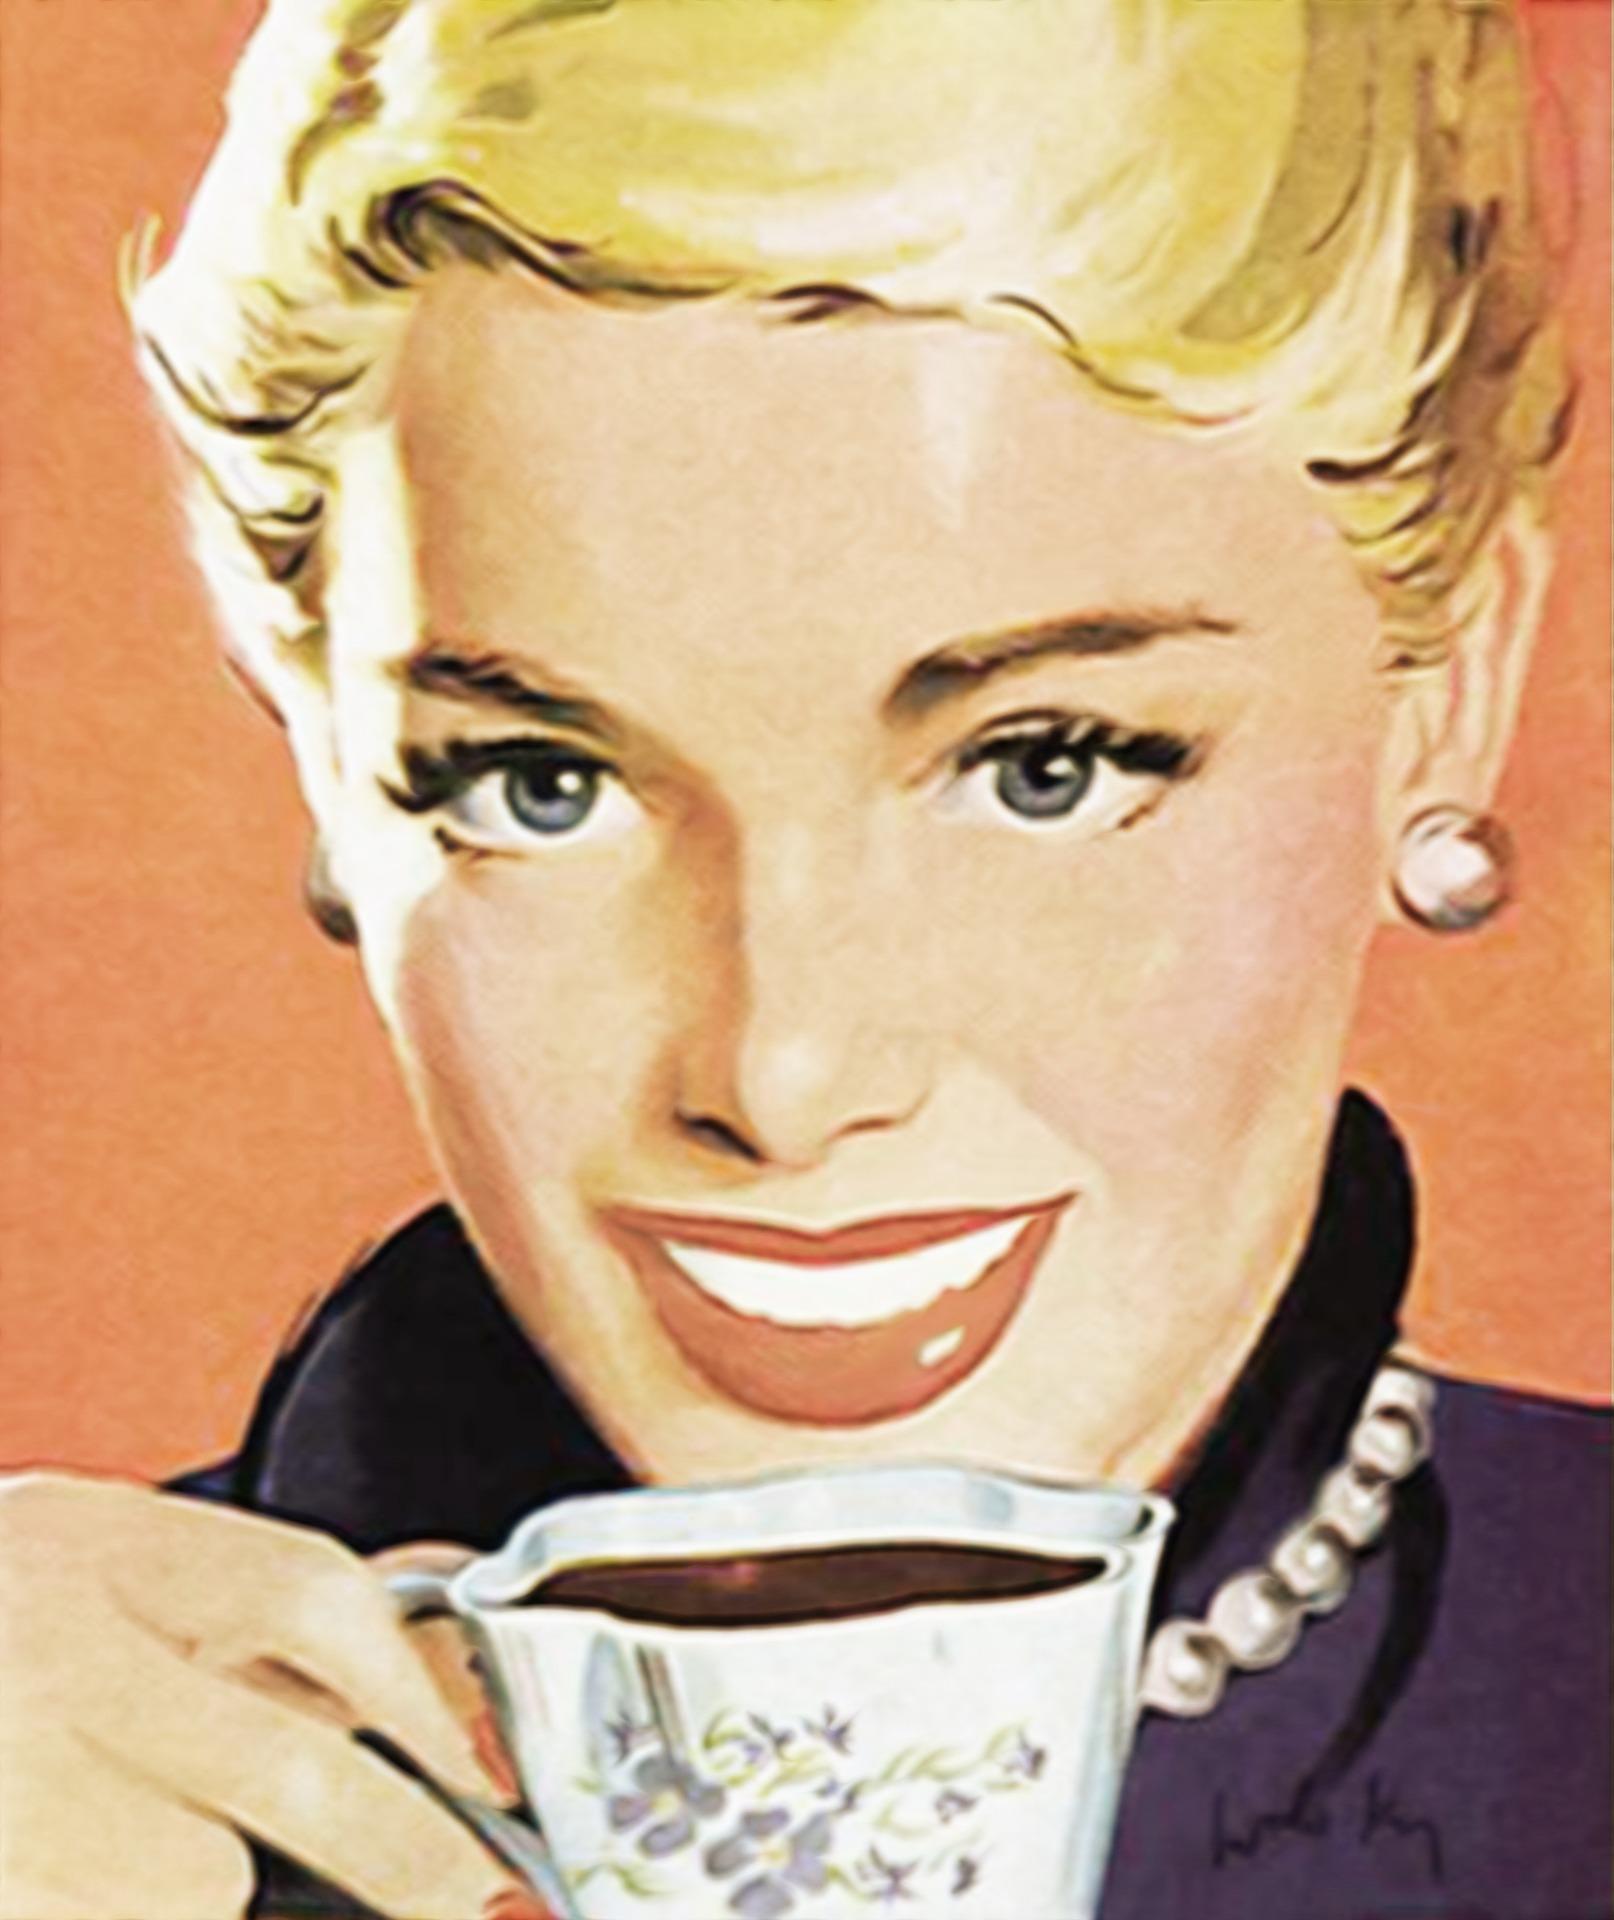 coffee-993845_1920.jpg